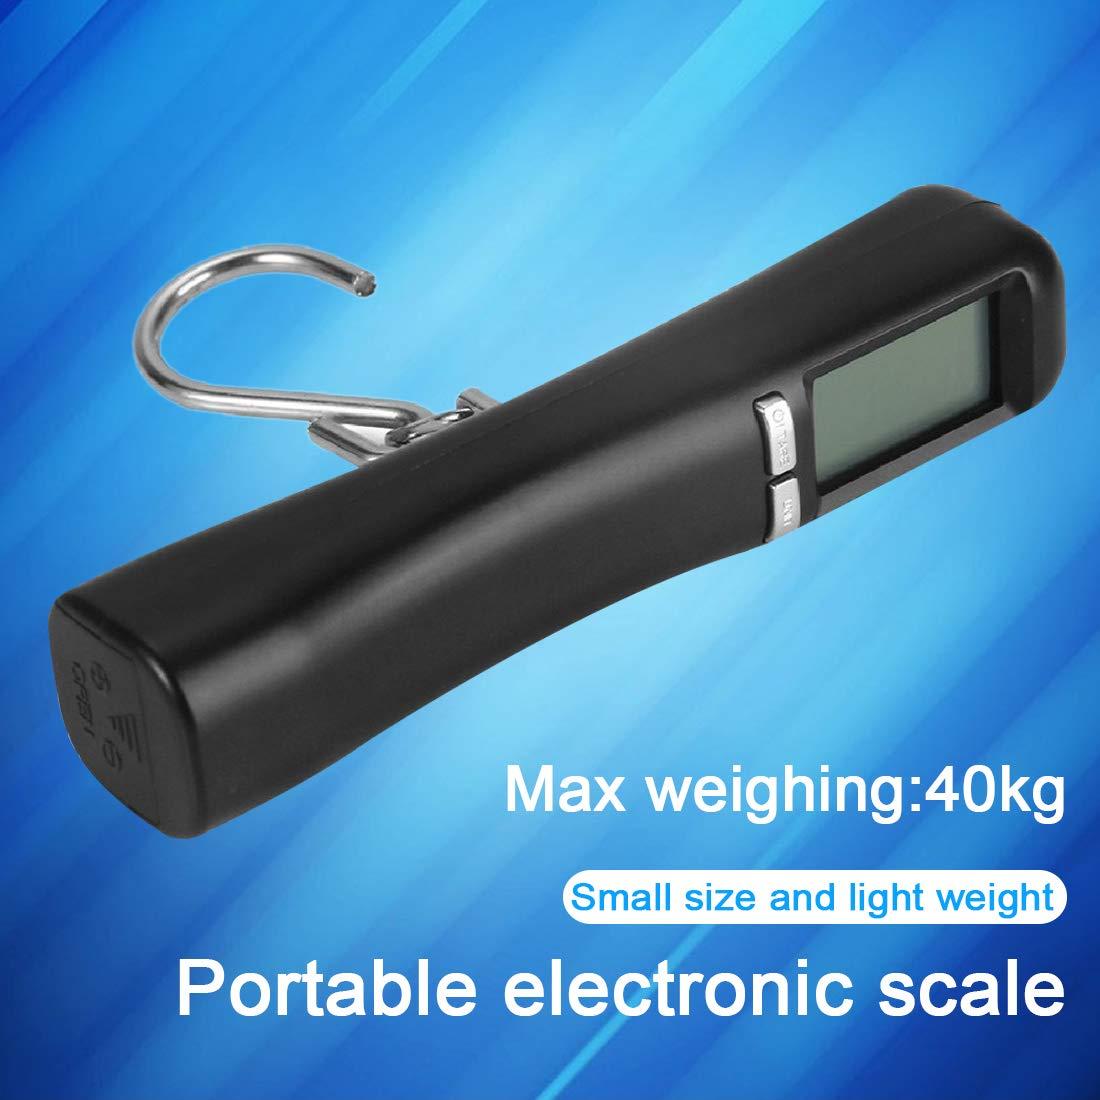 LCD Retroiluminada 40Kg Maleta de equipaje port/átil de viaje Peso de la balanza Escala de gancho de pesaje digital